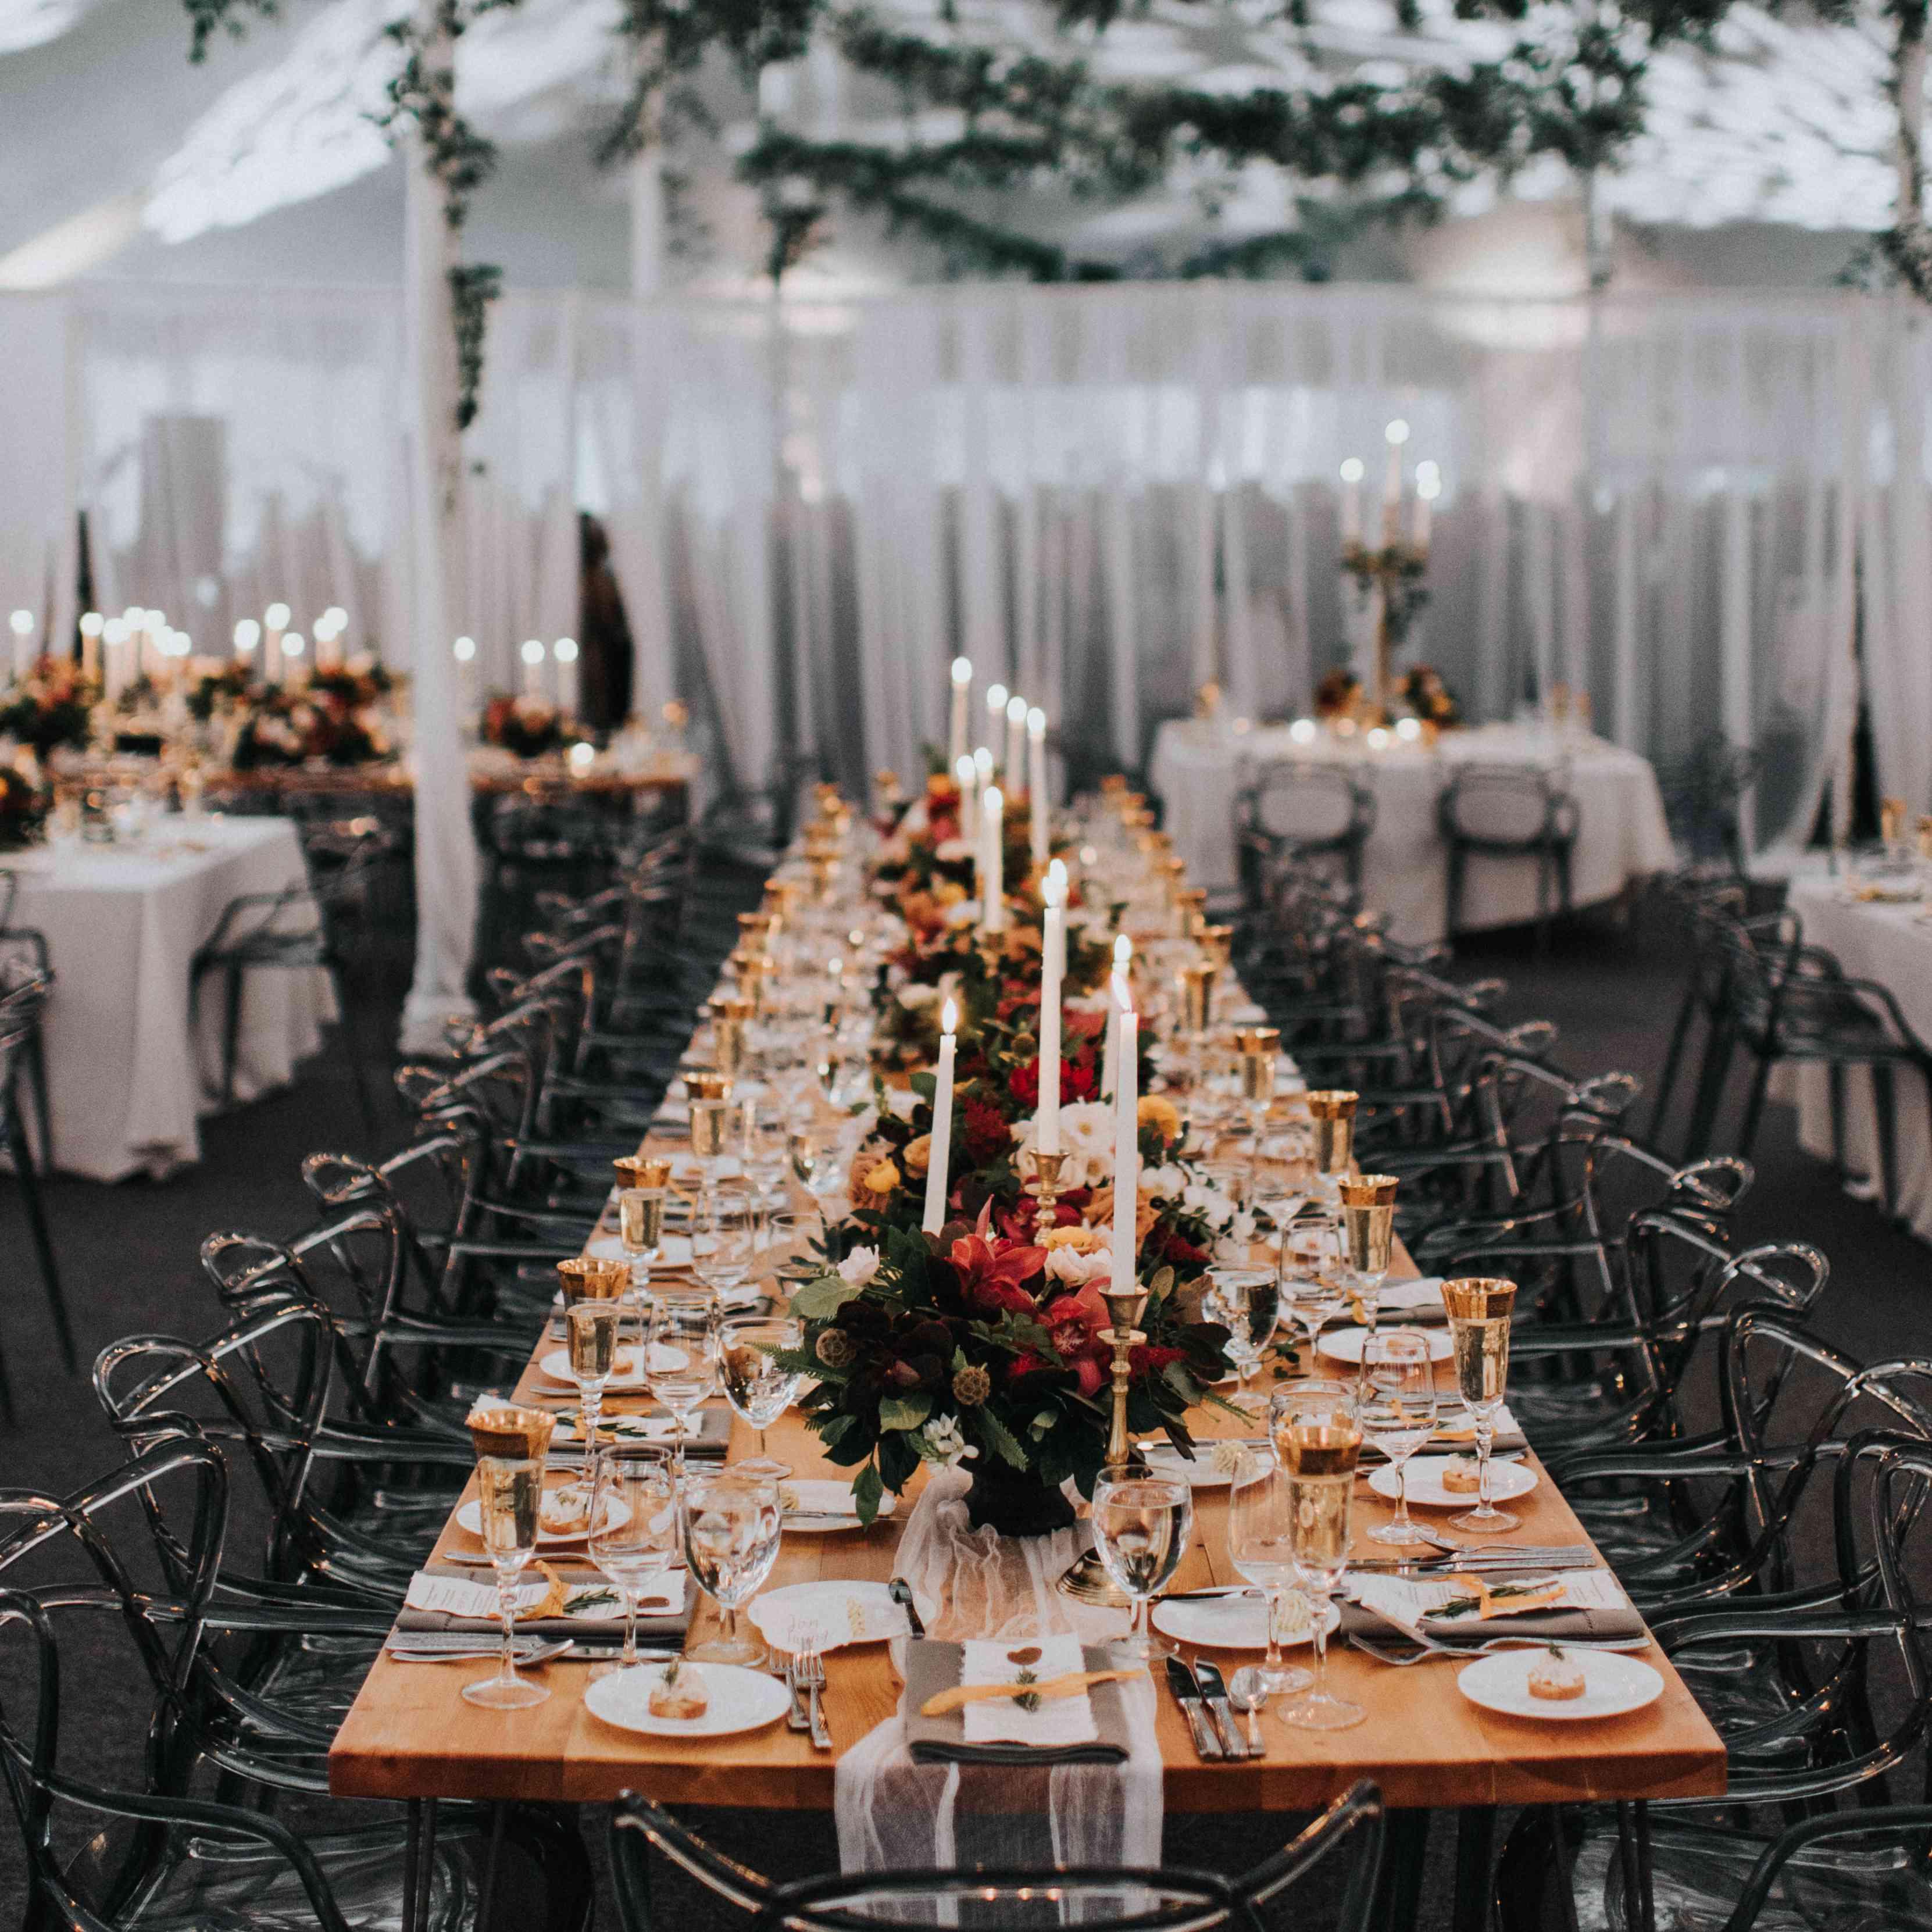 40 Festive Winter Wedding Ideas to Inspire Your Own Seasonal Soirée